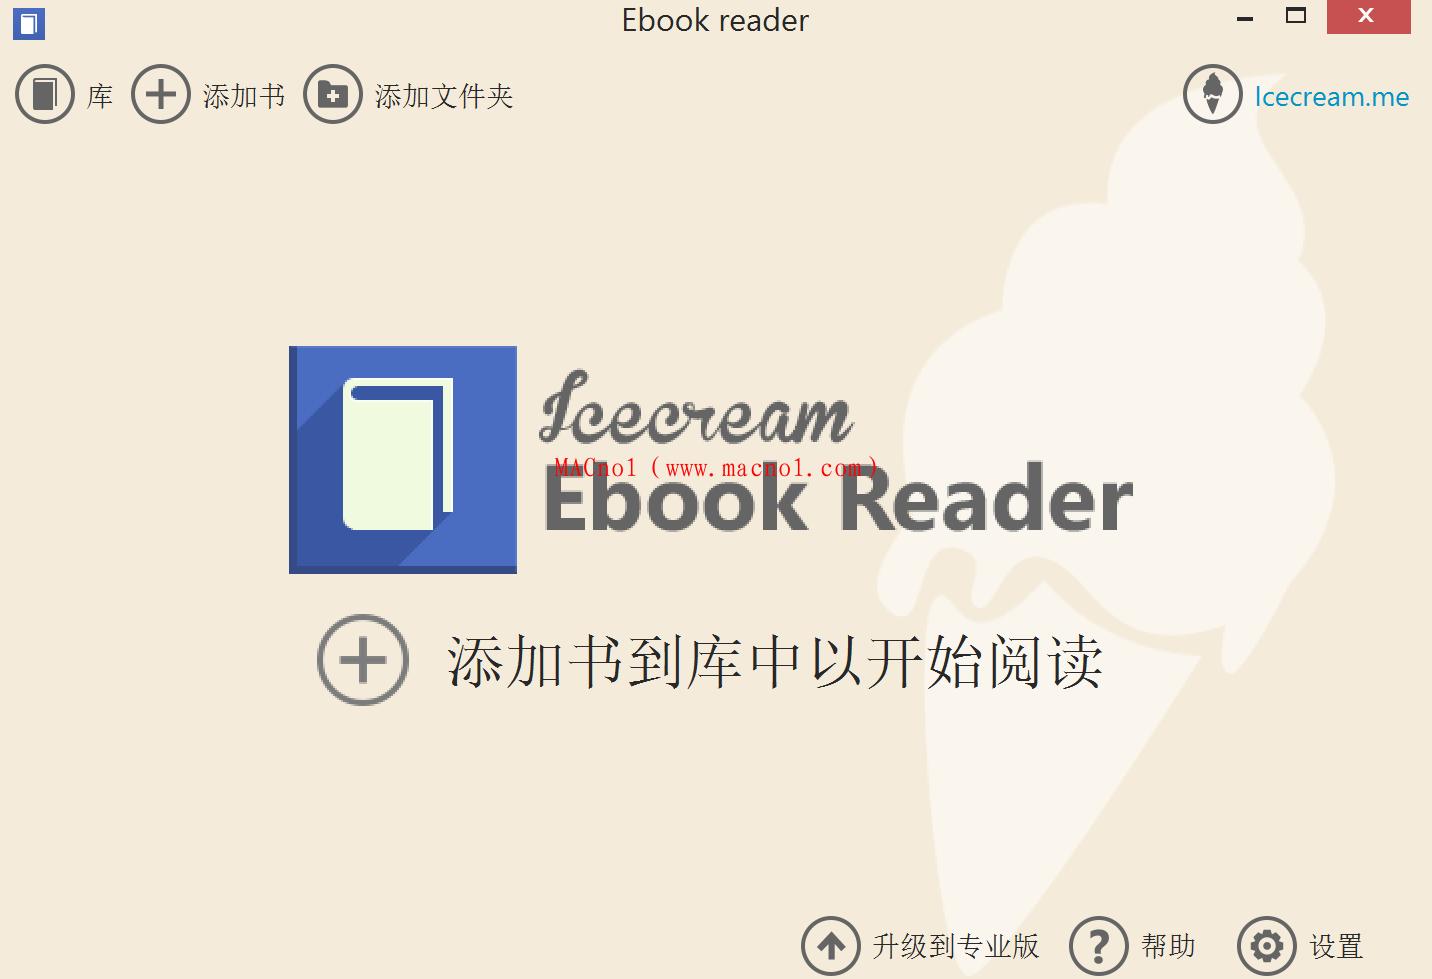 Icecream Ebook Reader 5.png